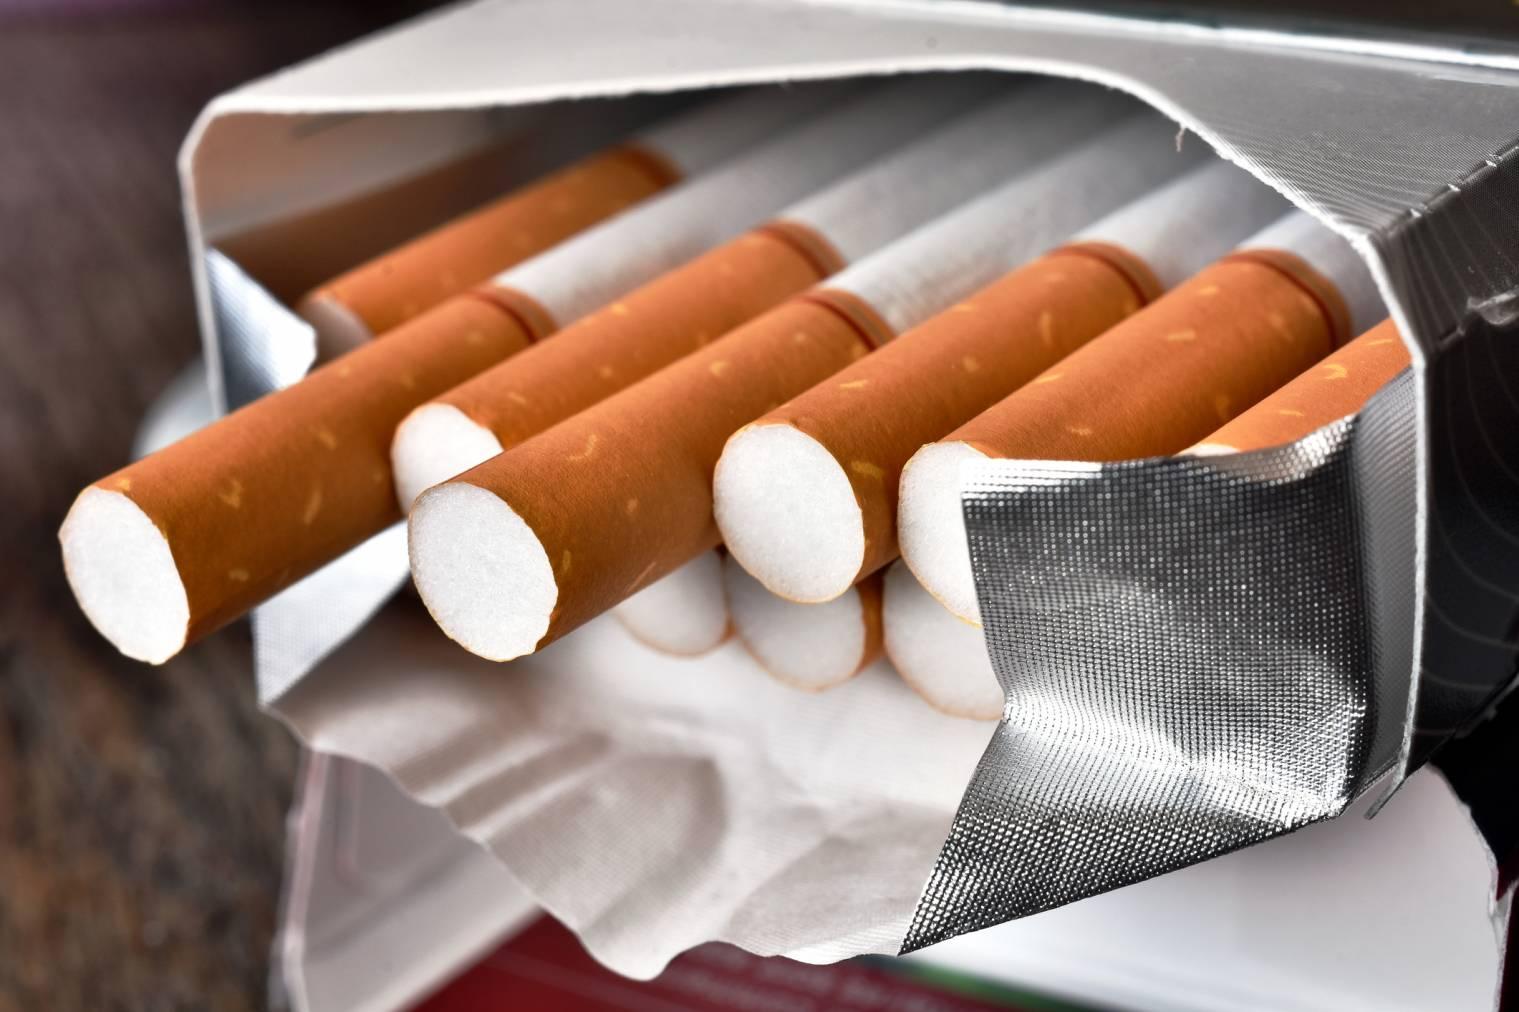 réglementation débit tabac